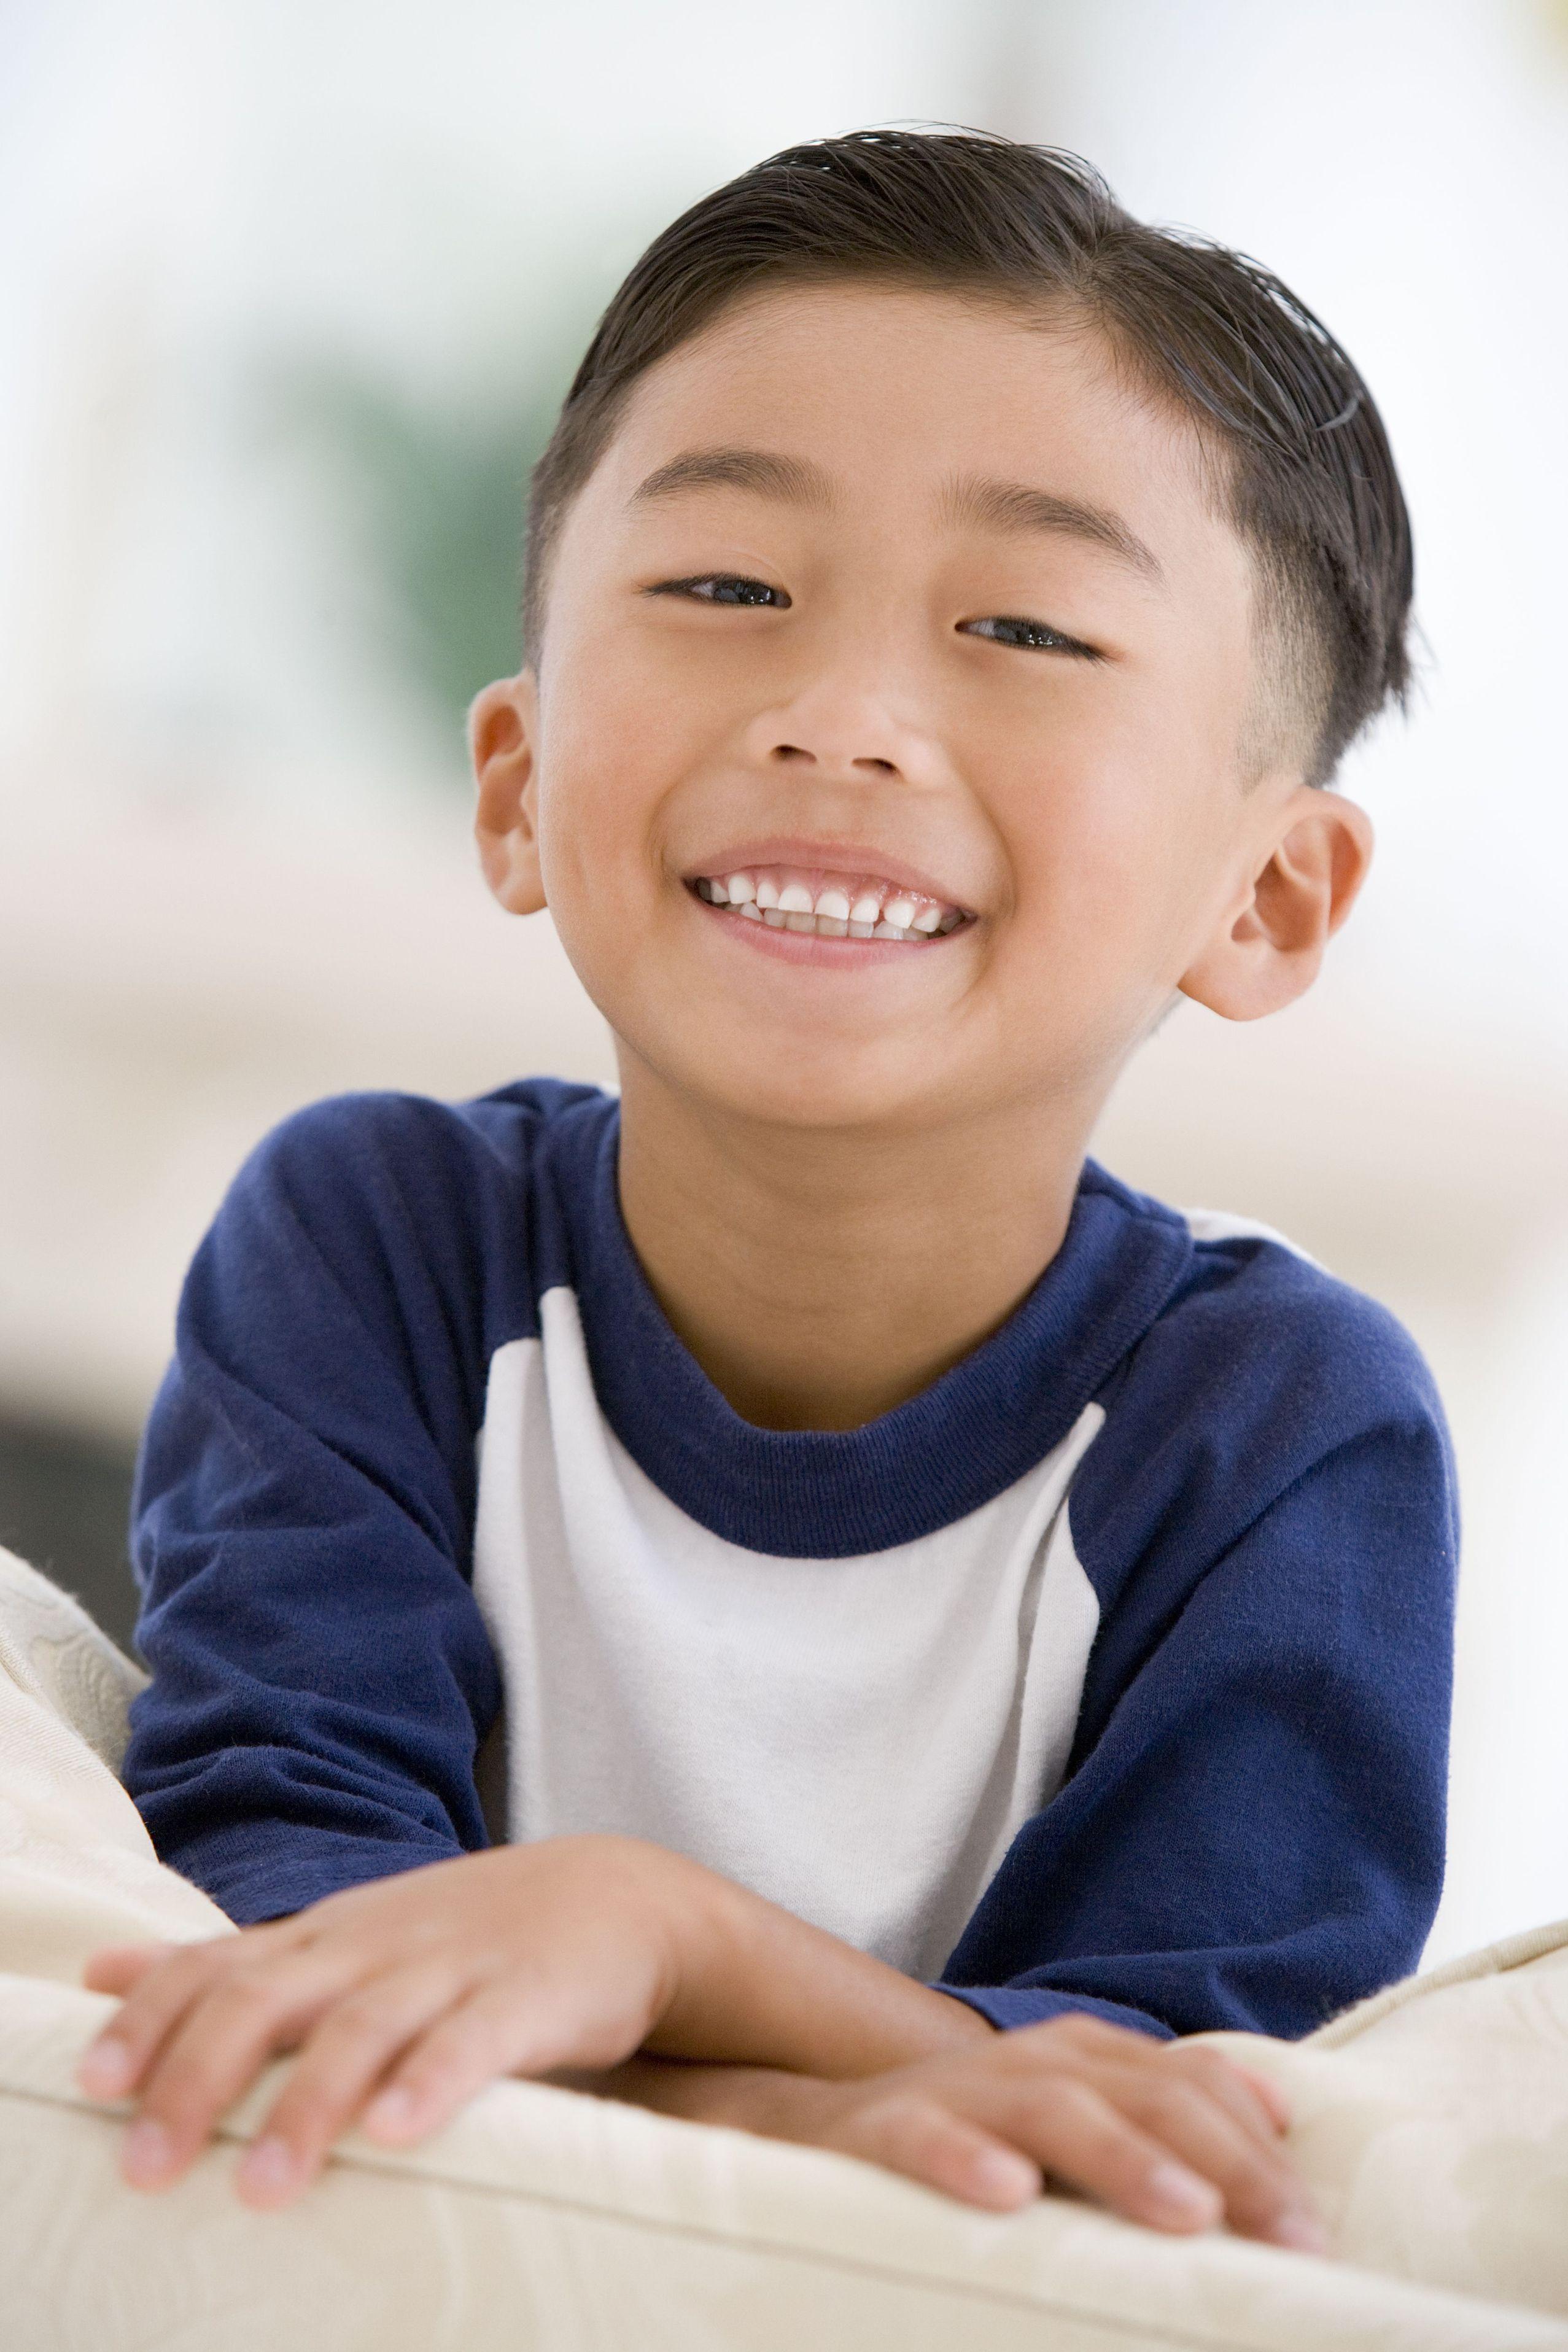 Where can I find a Plainview Pediatric Dentist?